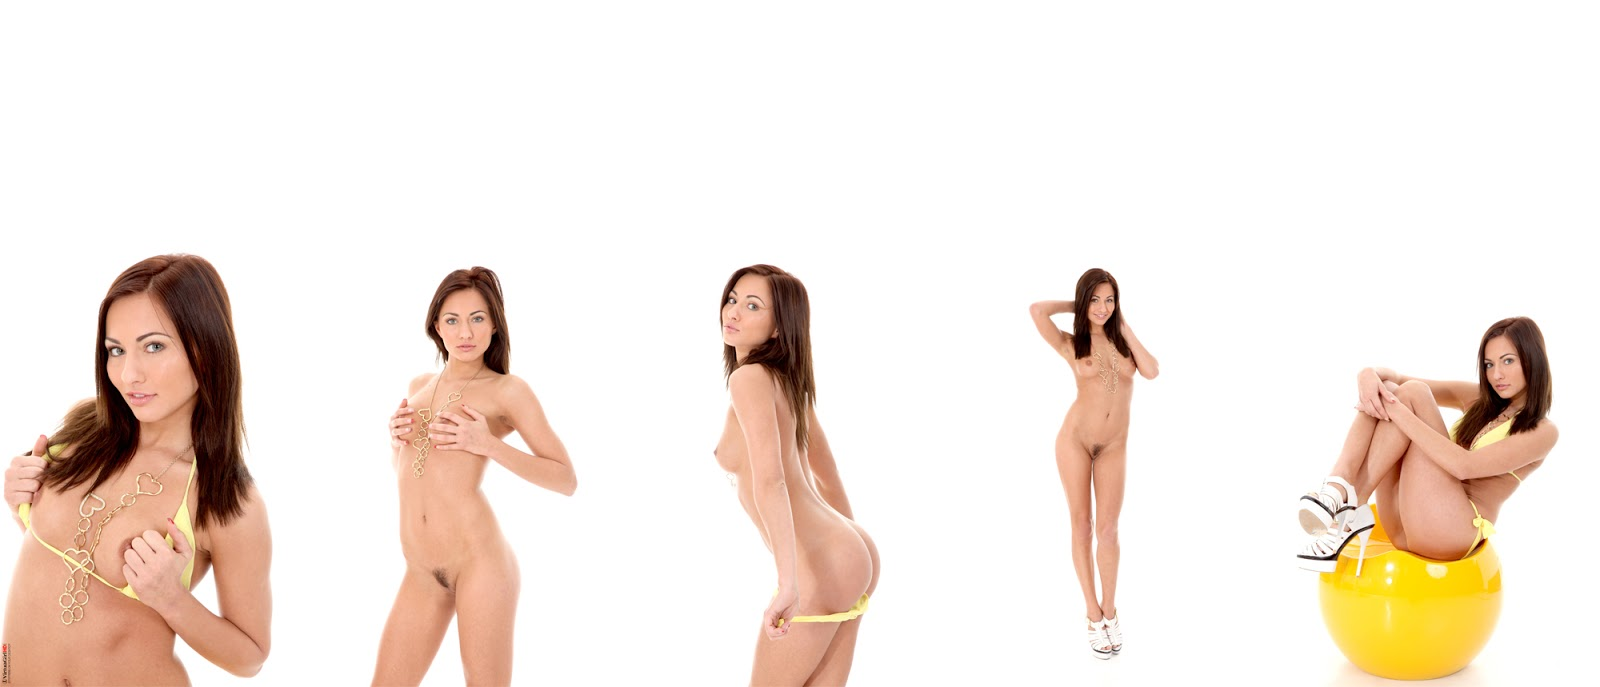 Sexy Model Naked Pussy VirtuaGirl HD